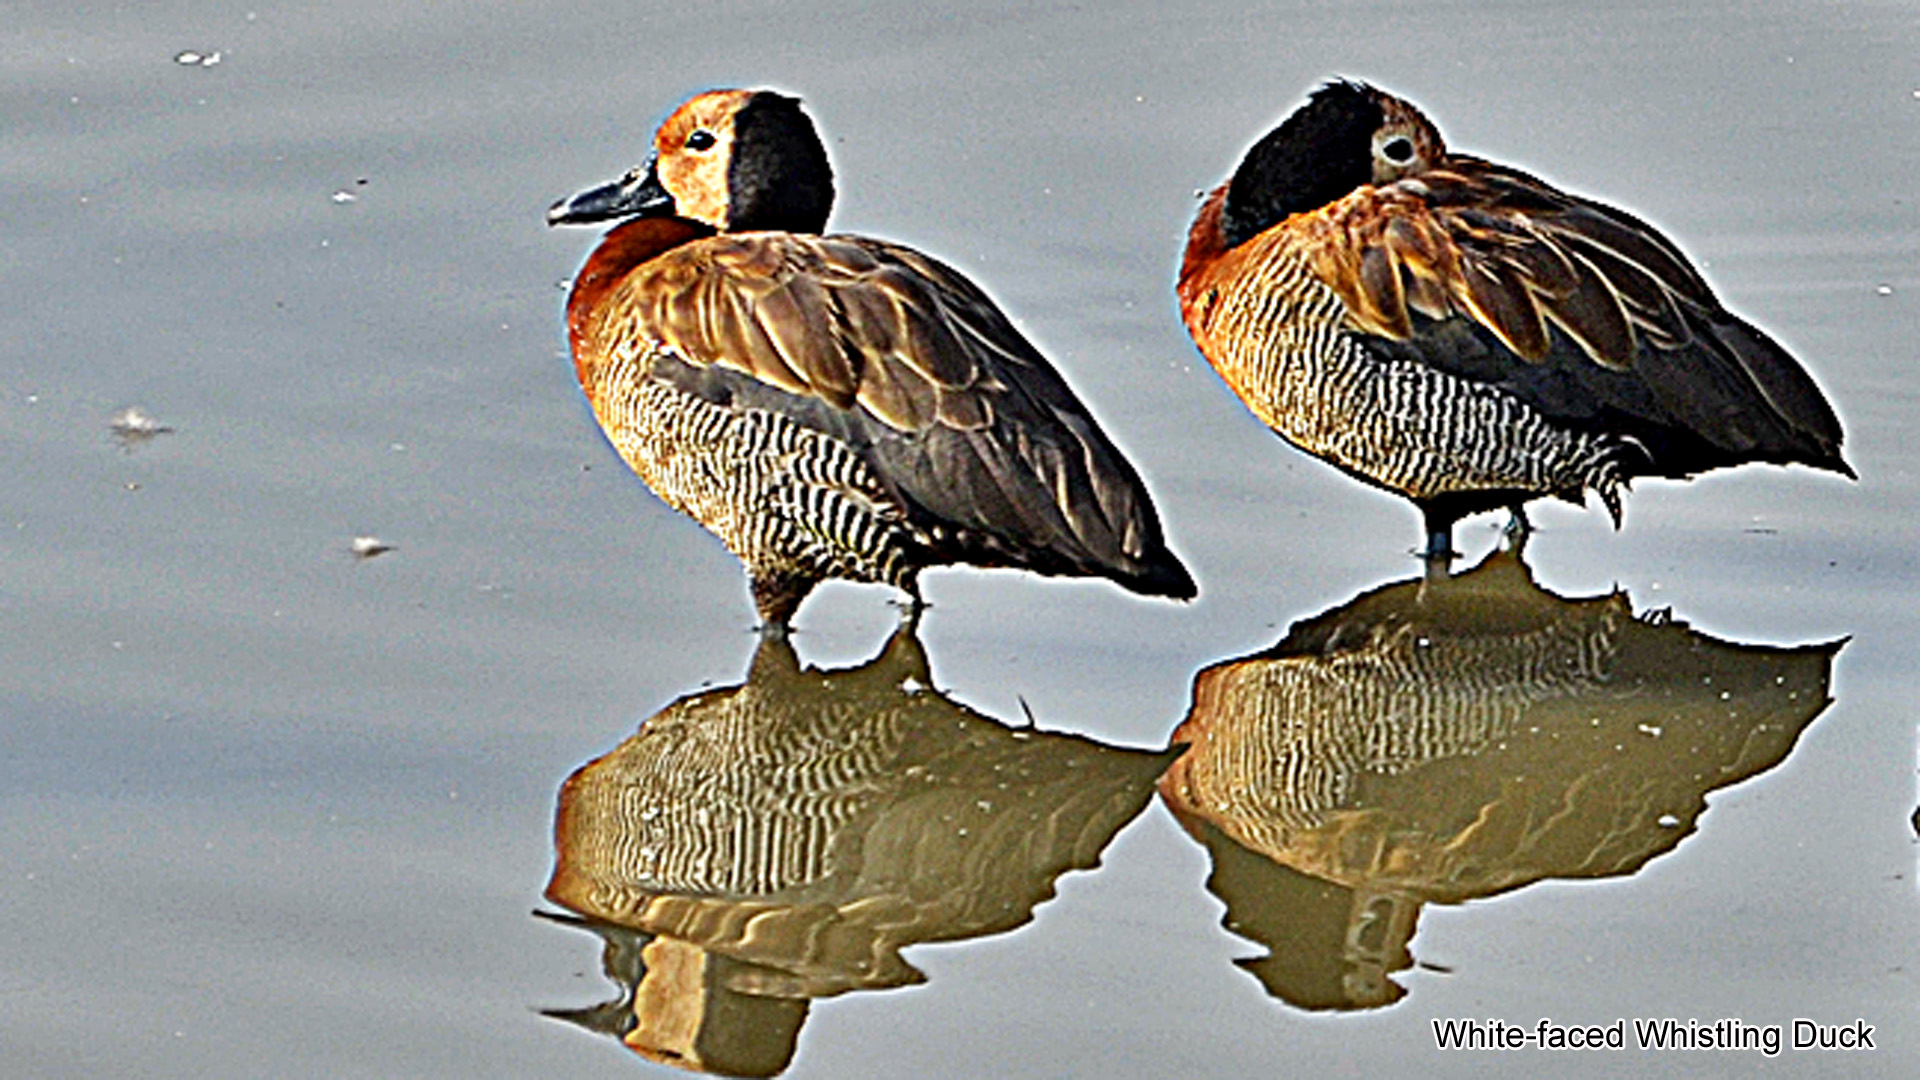 2b, White-faced Whistling Duck